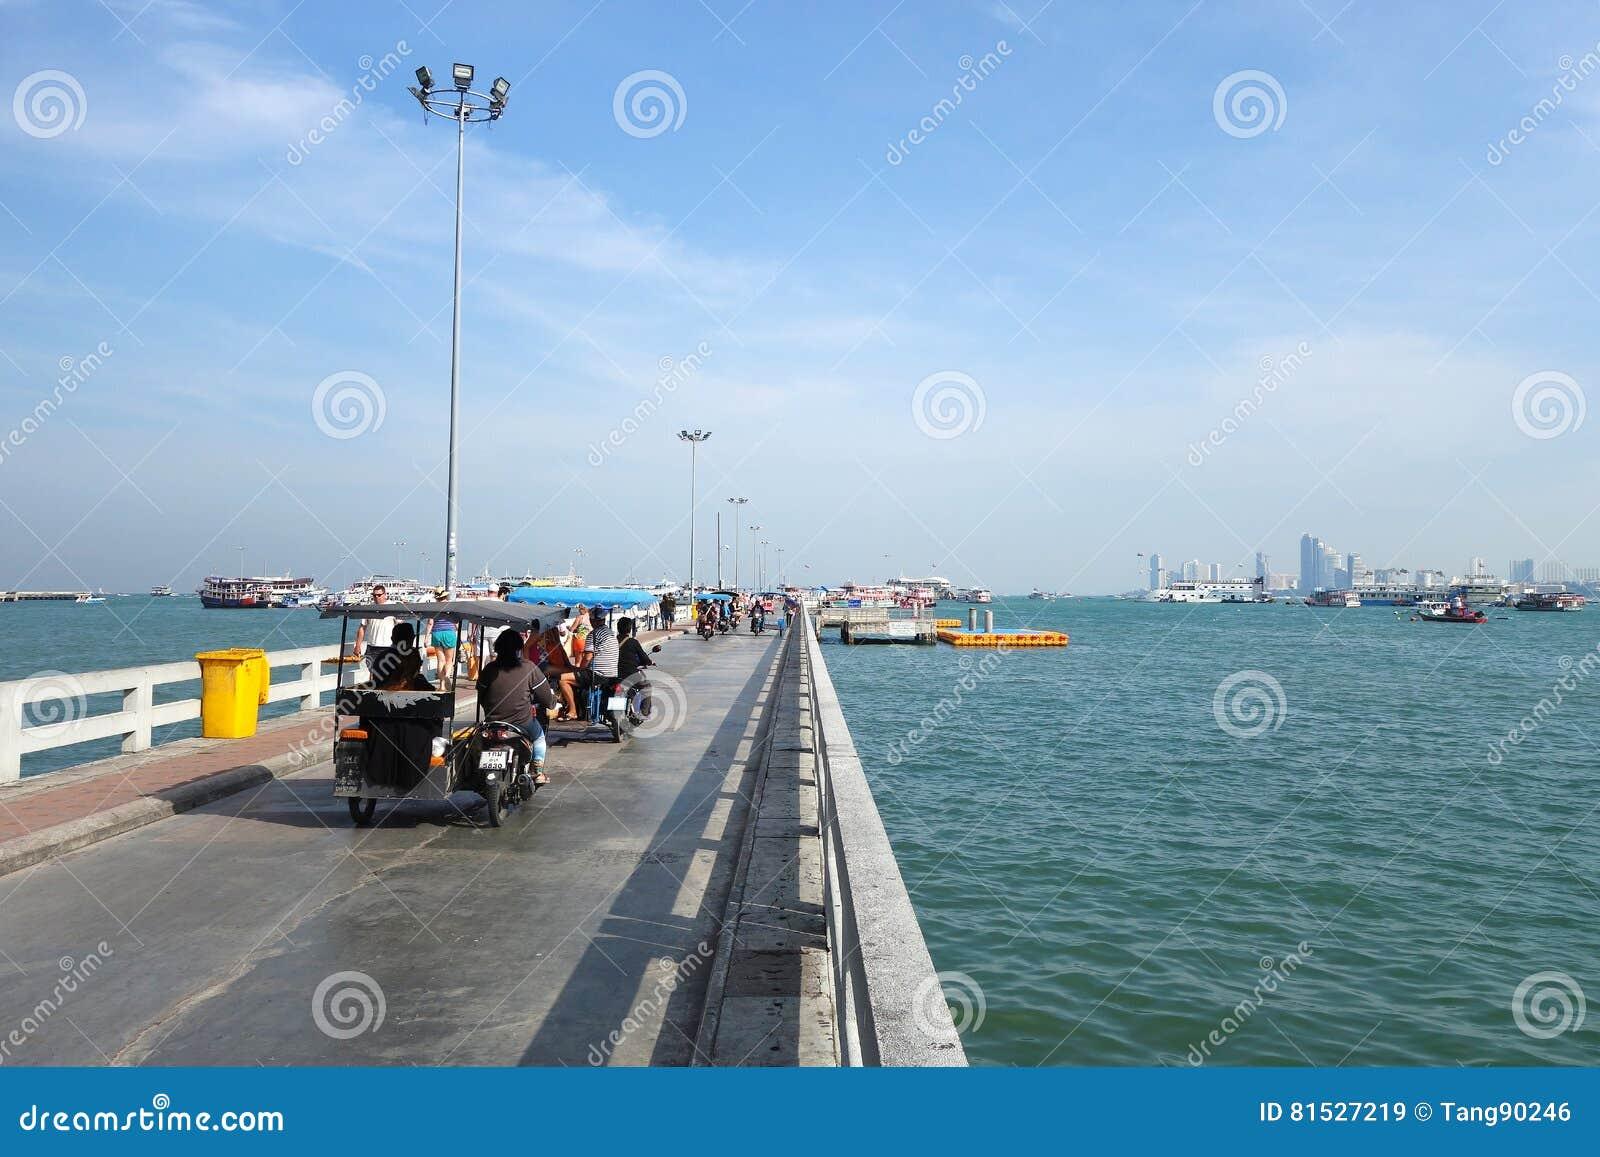 Where Is Bali Hai Island bali hai pier, located in the heart of pattaya editorial